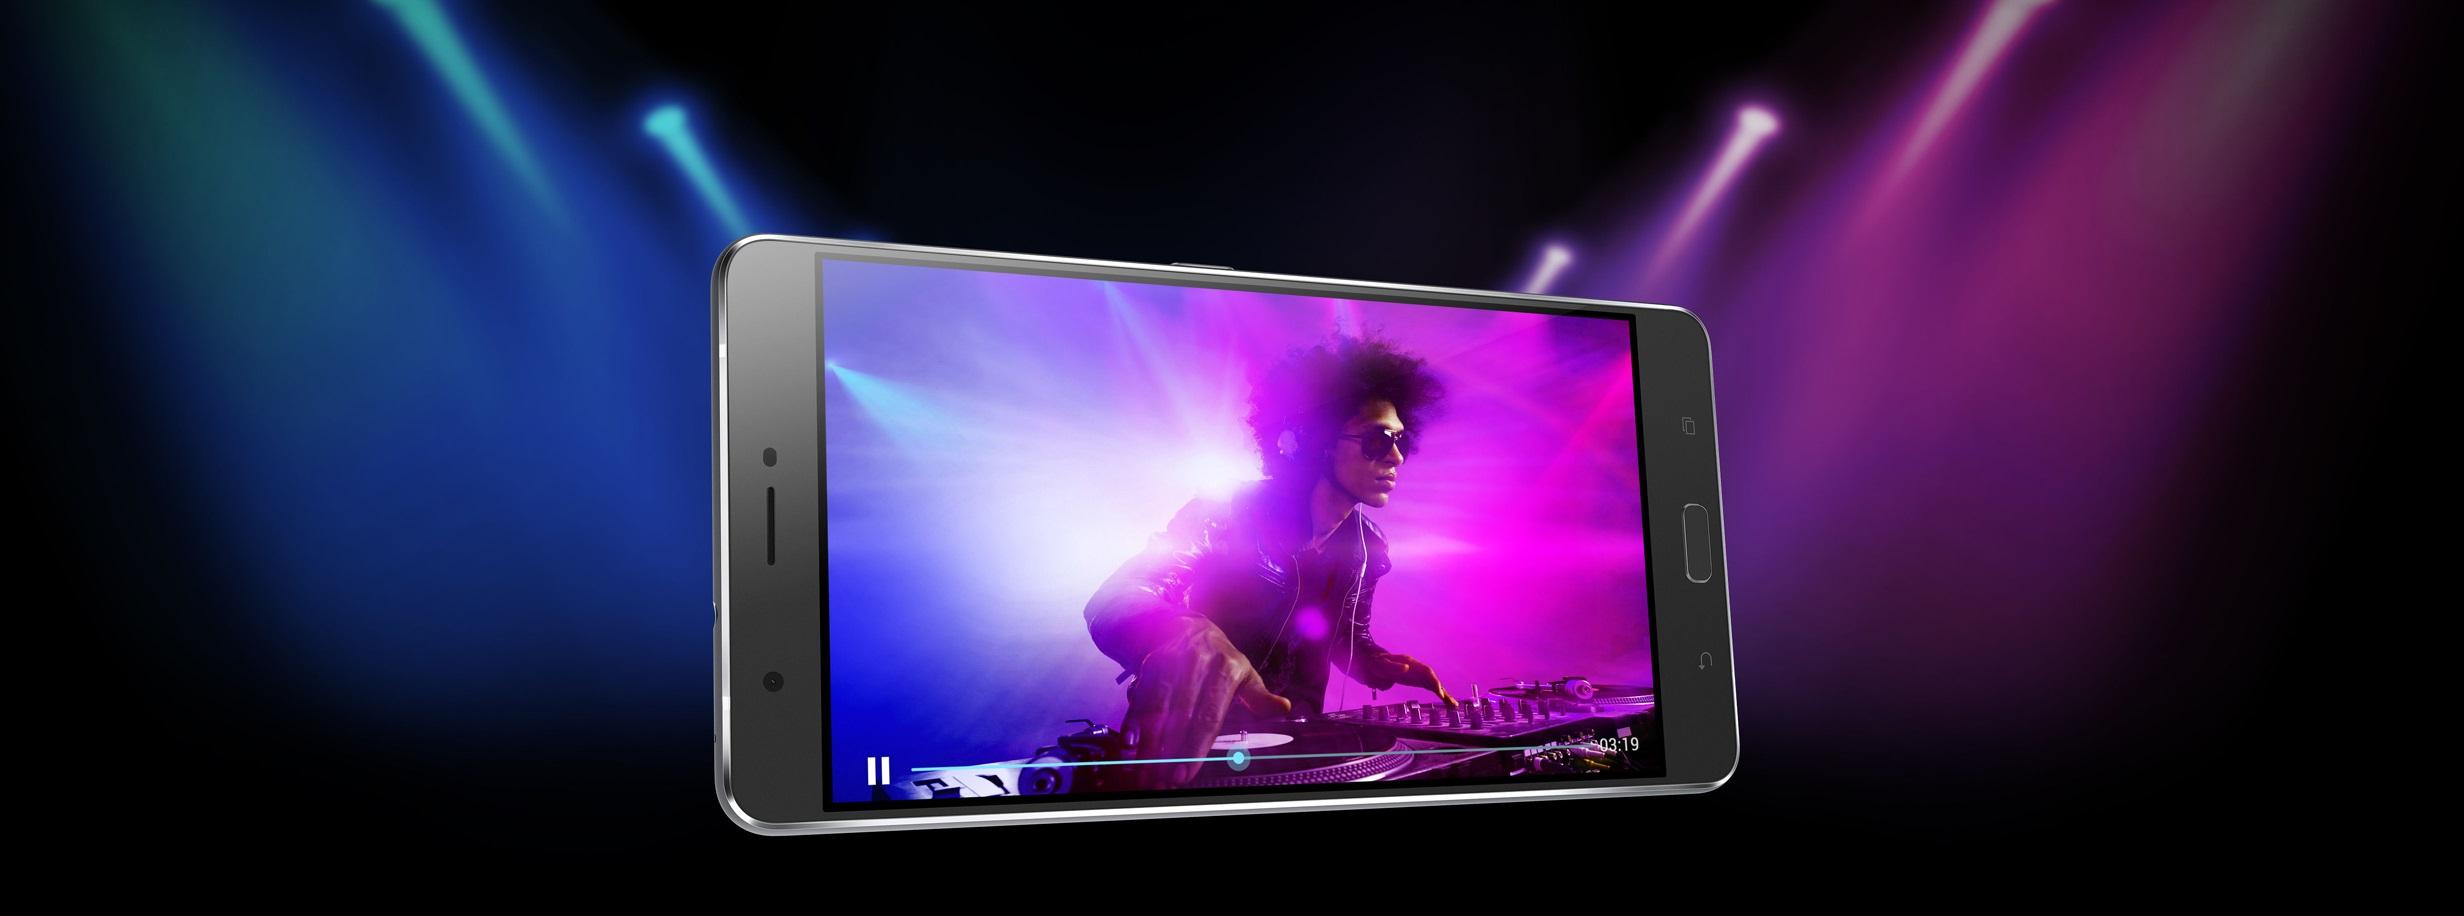 asus-zenfone-3-ultra-ekran-boyutu